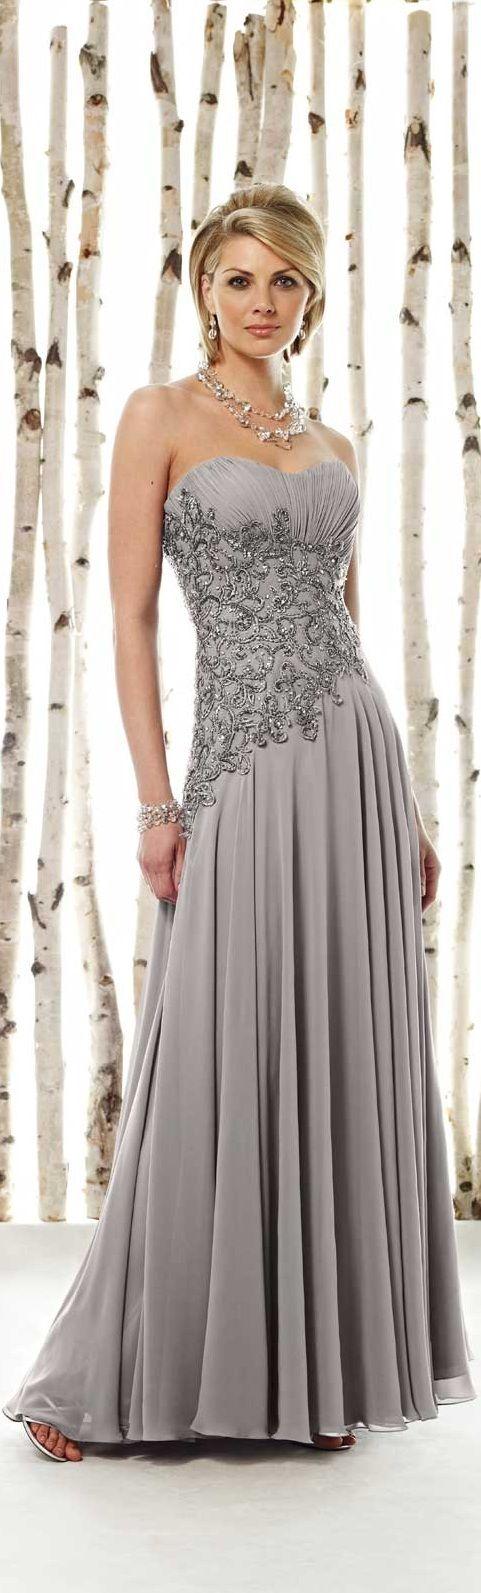 De La Cruz Saga ~ 25th Anniversary Ball delacruzsagabyptm... Cameron Blake haute couture 2013/2014 ~ Read More : http://goldblood.biz/plum-toned-coat/